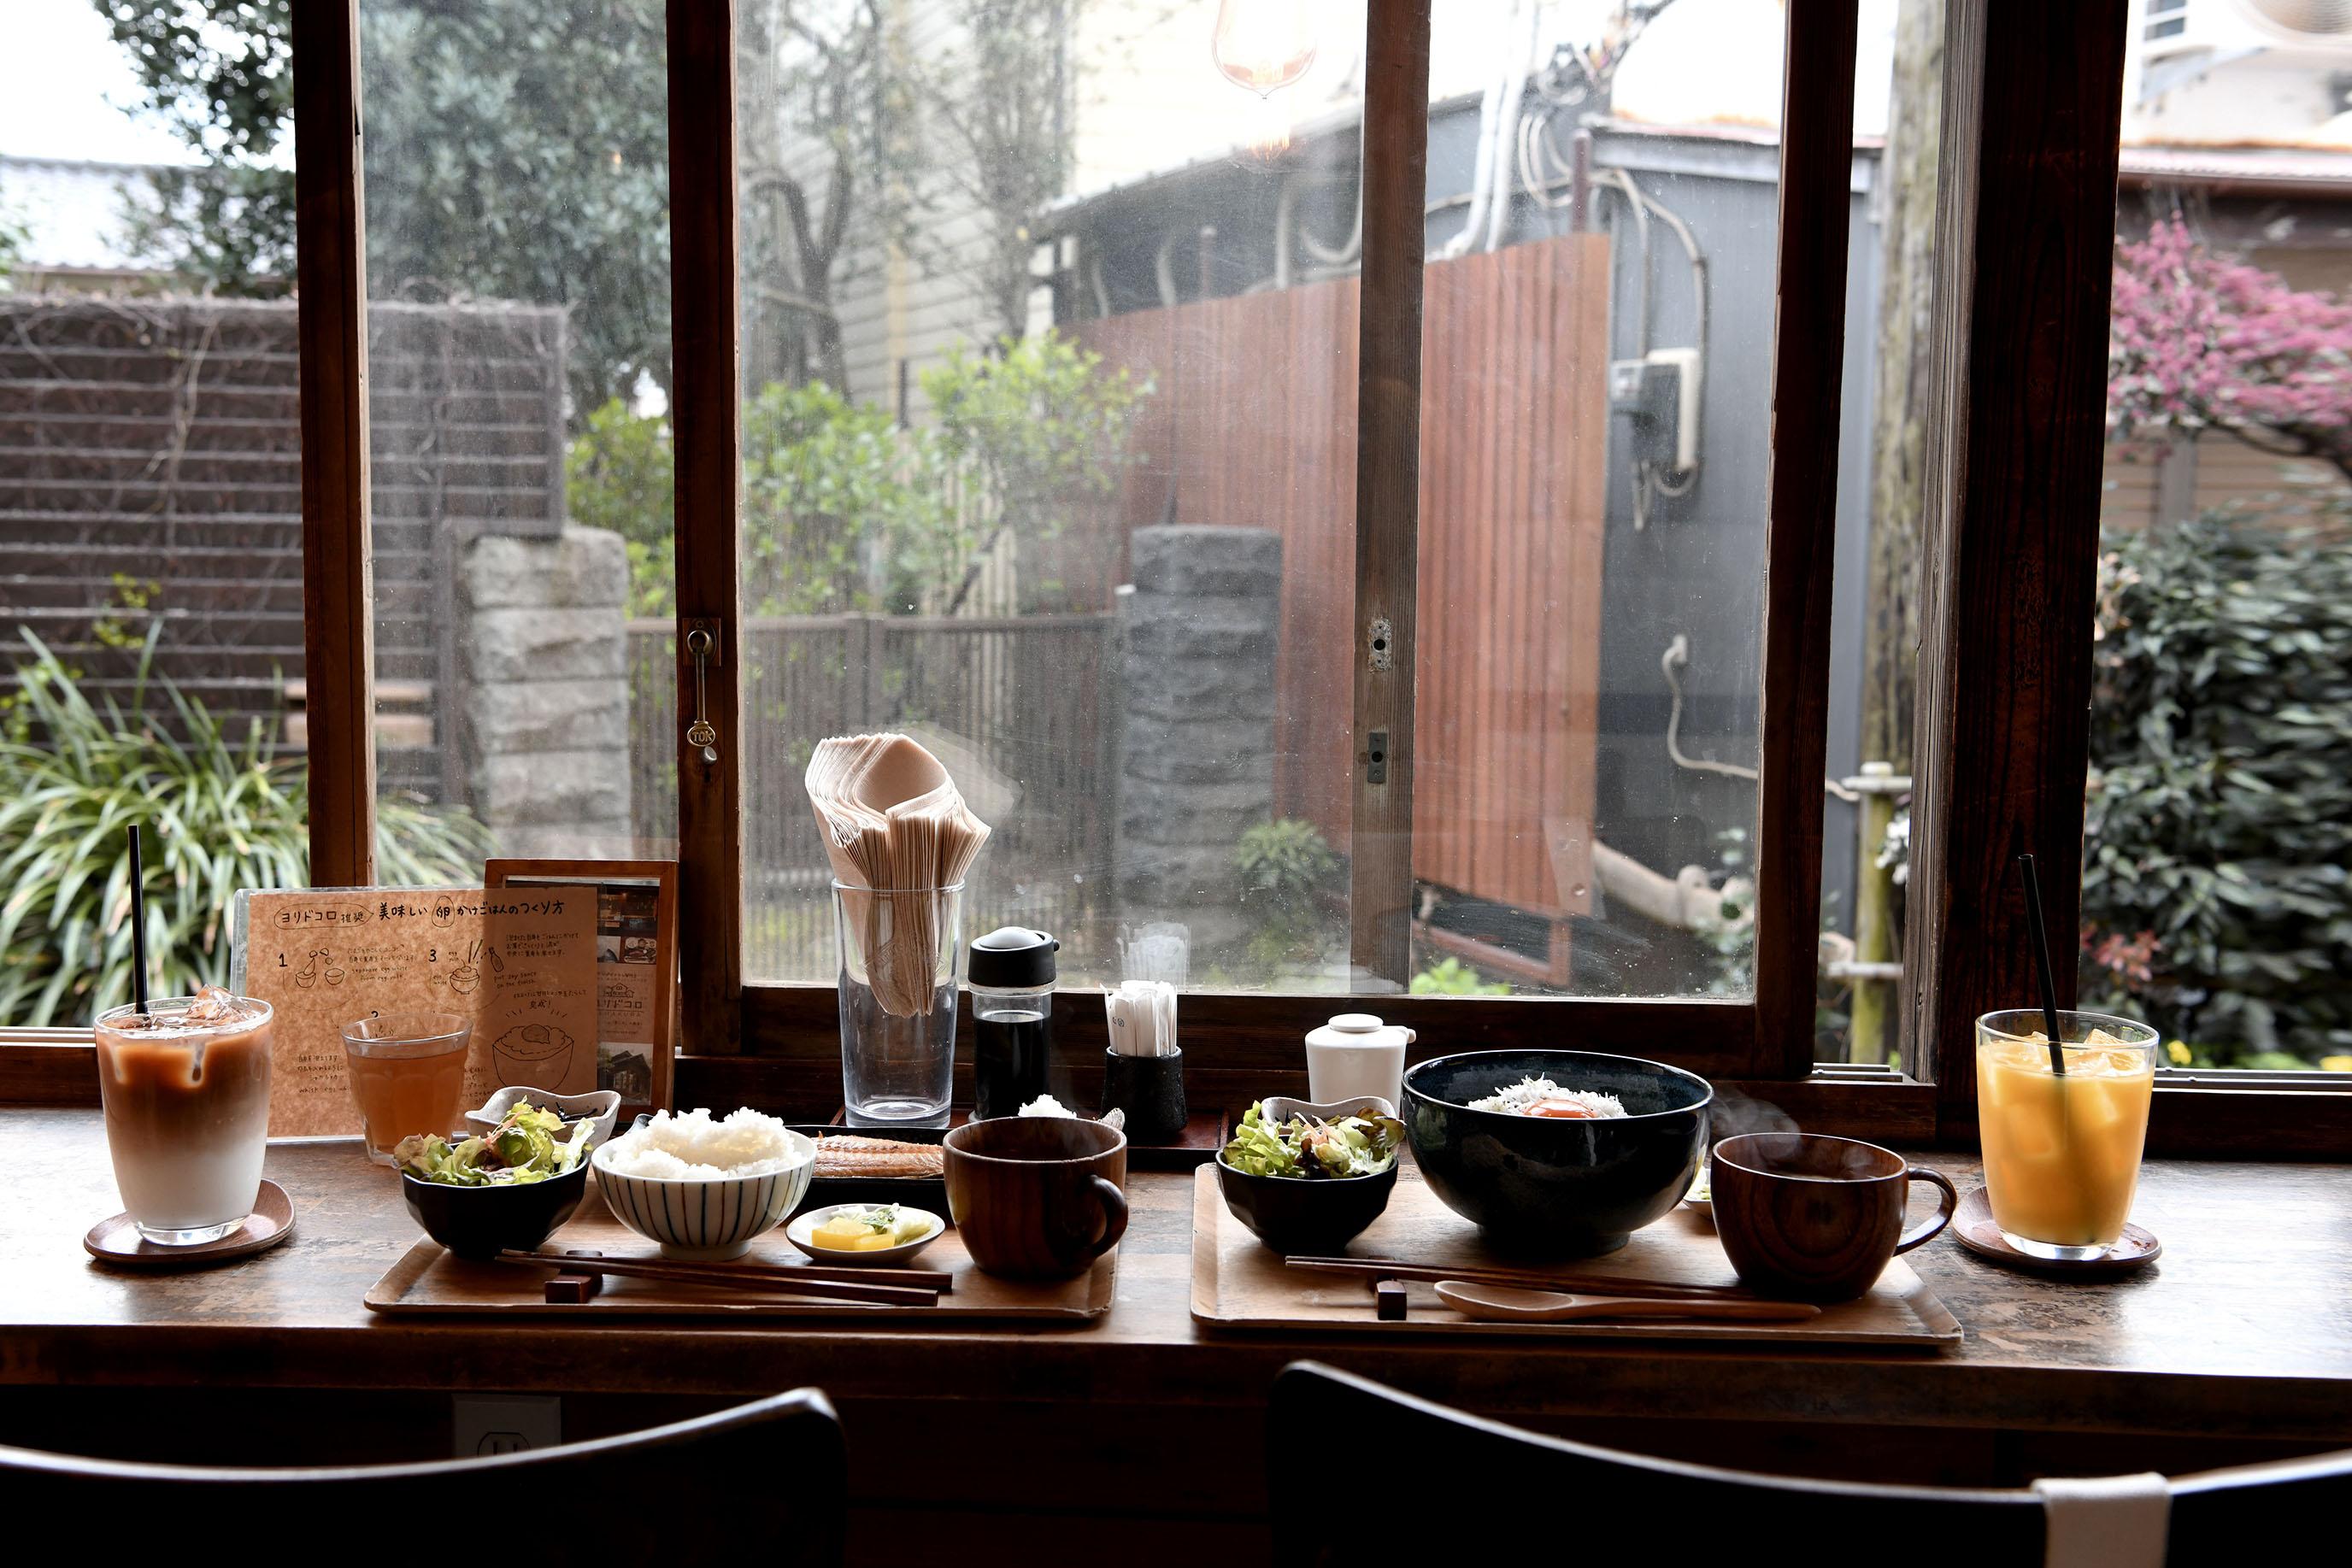 鐮倉ヨリドコロ|鐵道旁的日式咖啡館,電車緩緩駛過,成了最令人期待的景色。